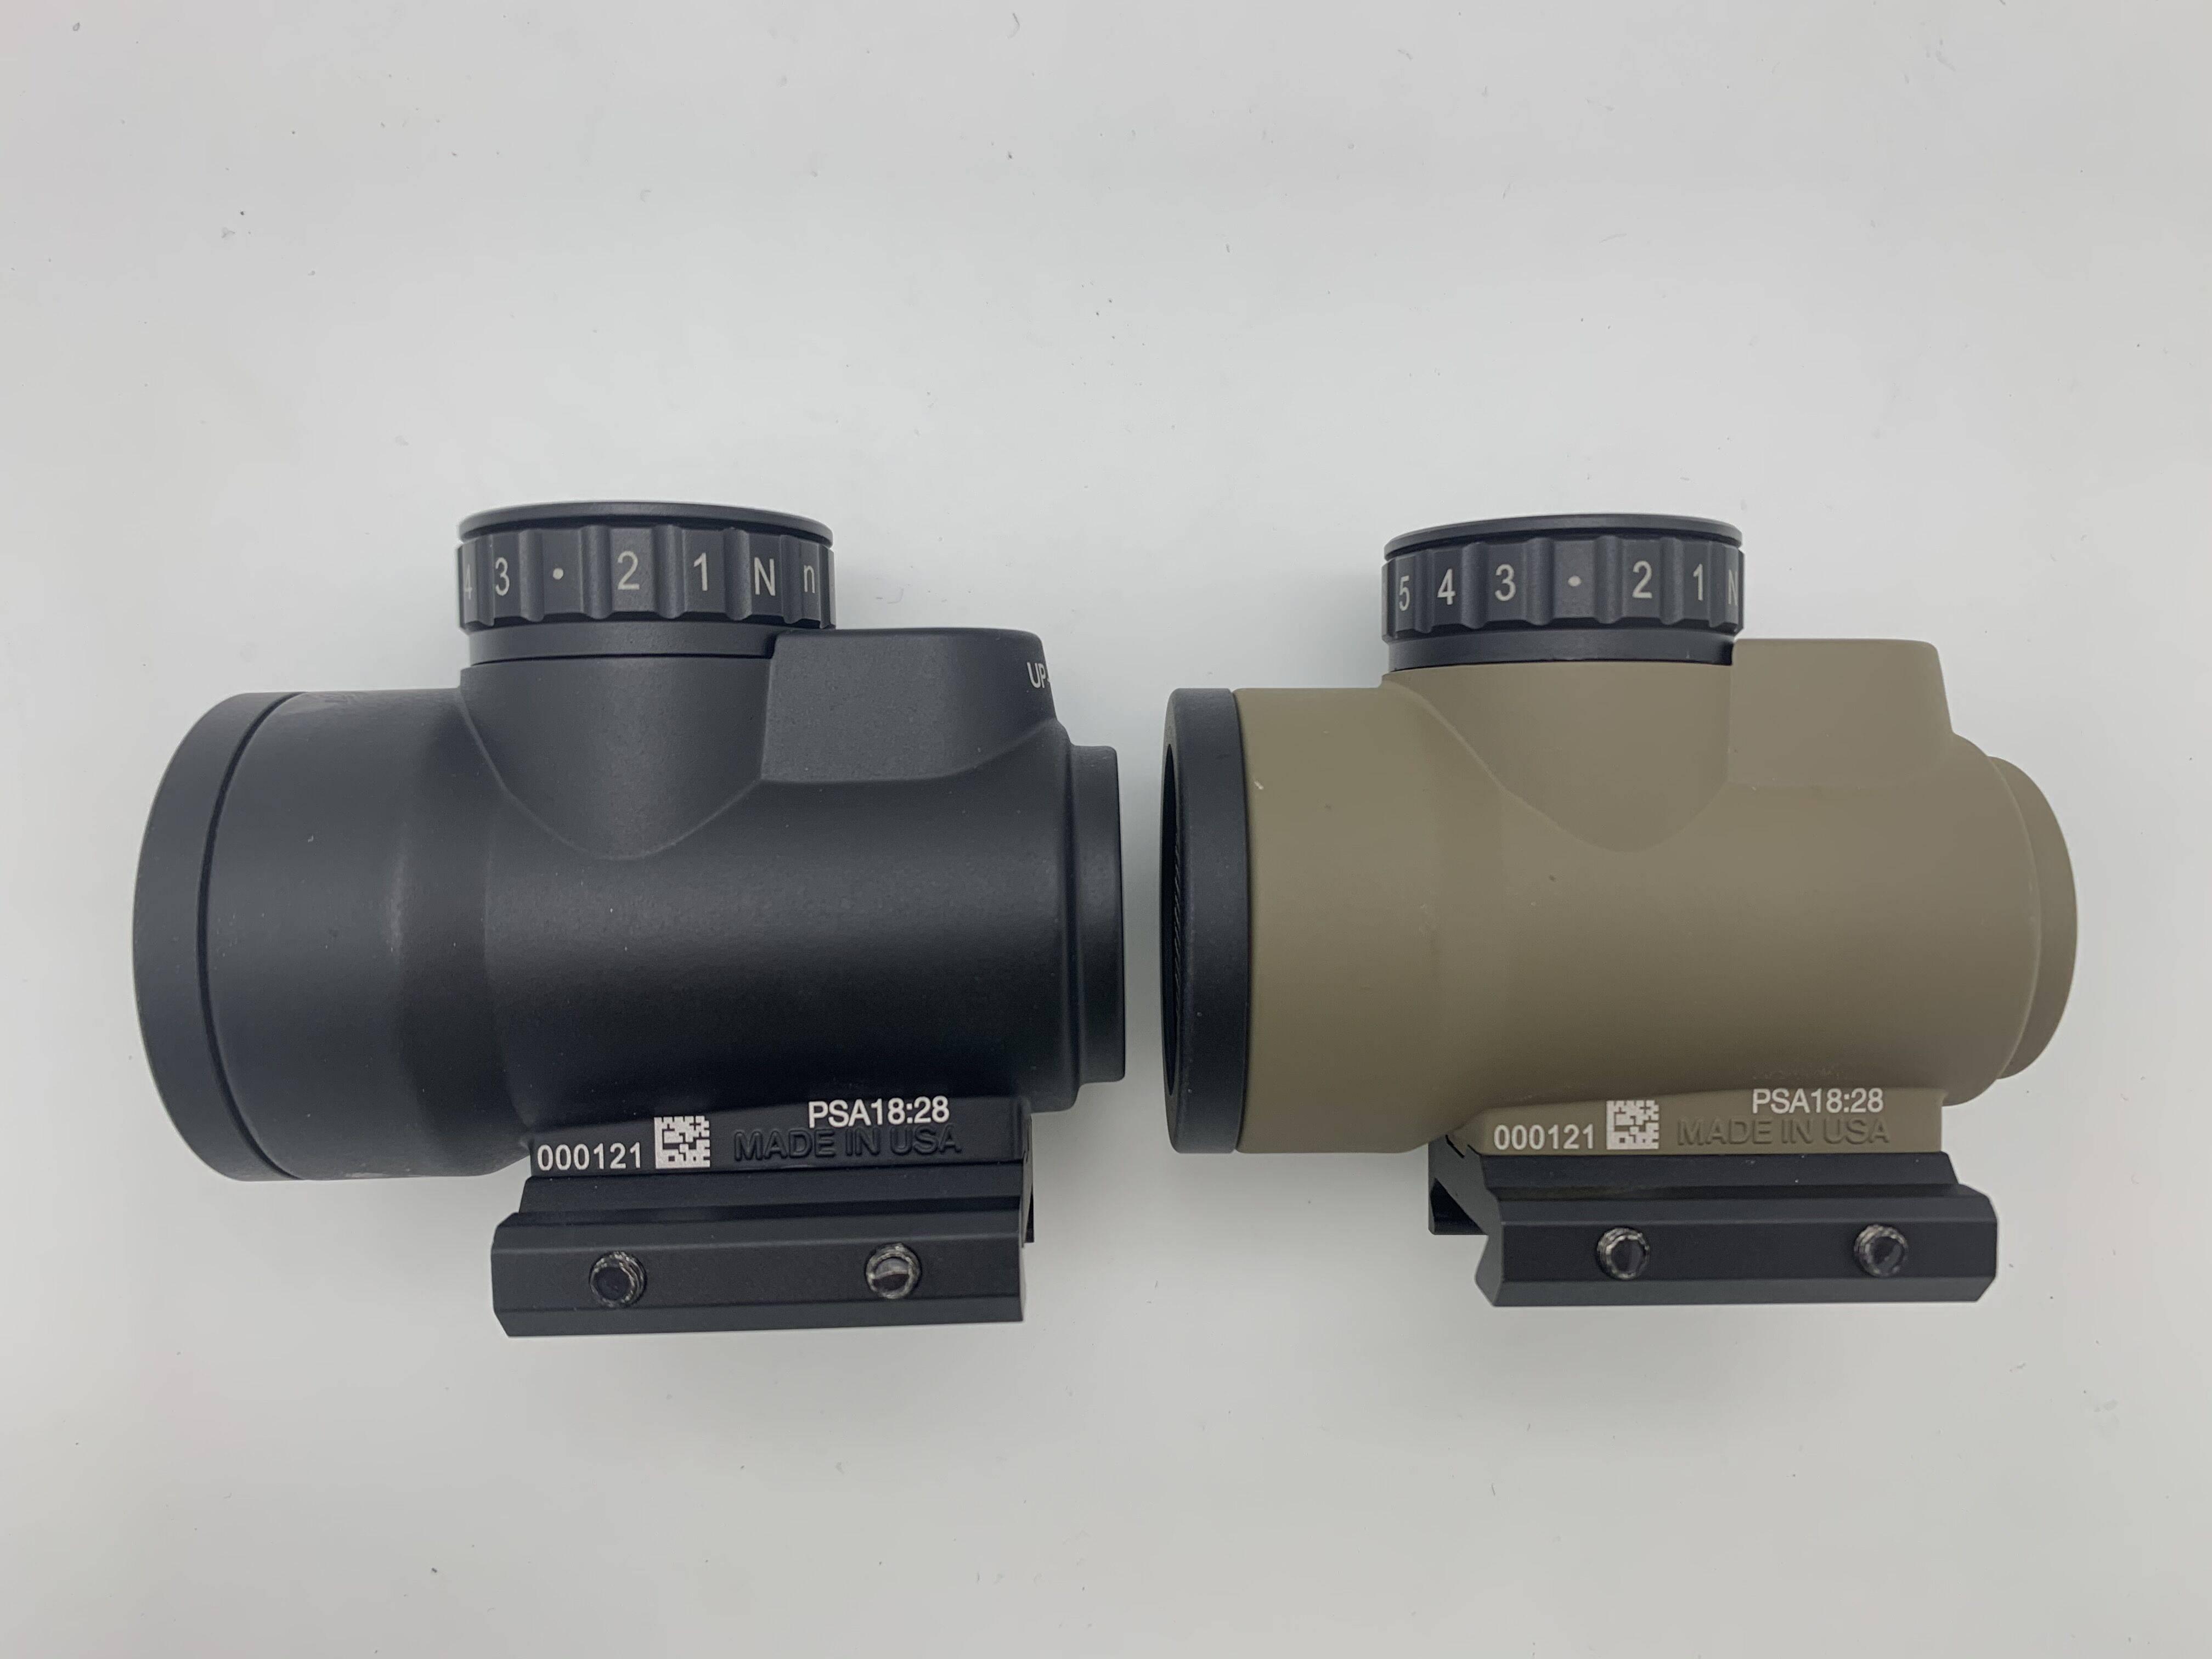 MRO red dot sight, nice red dot scope for airgun